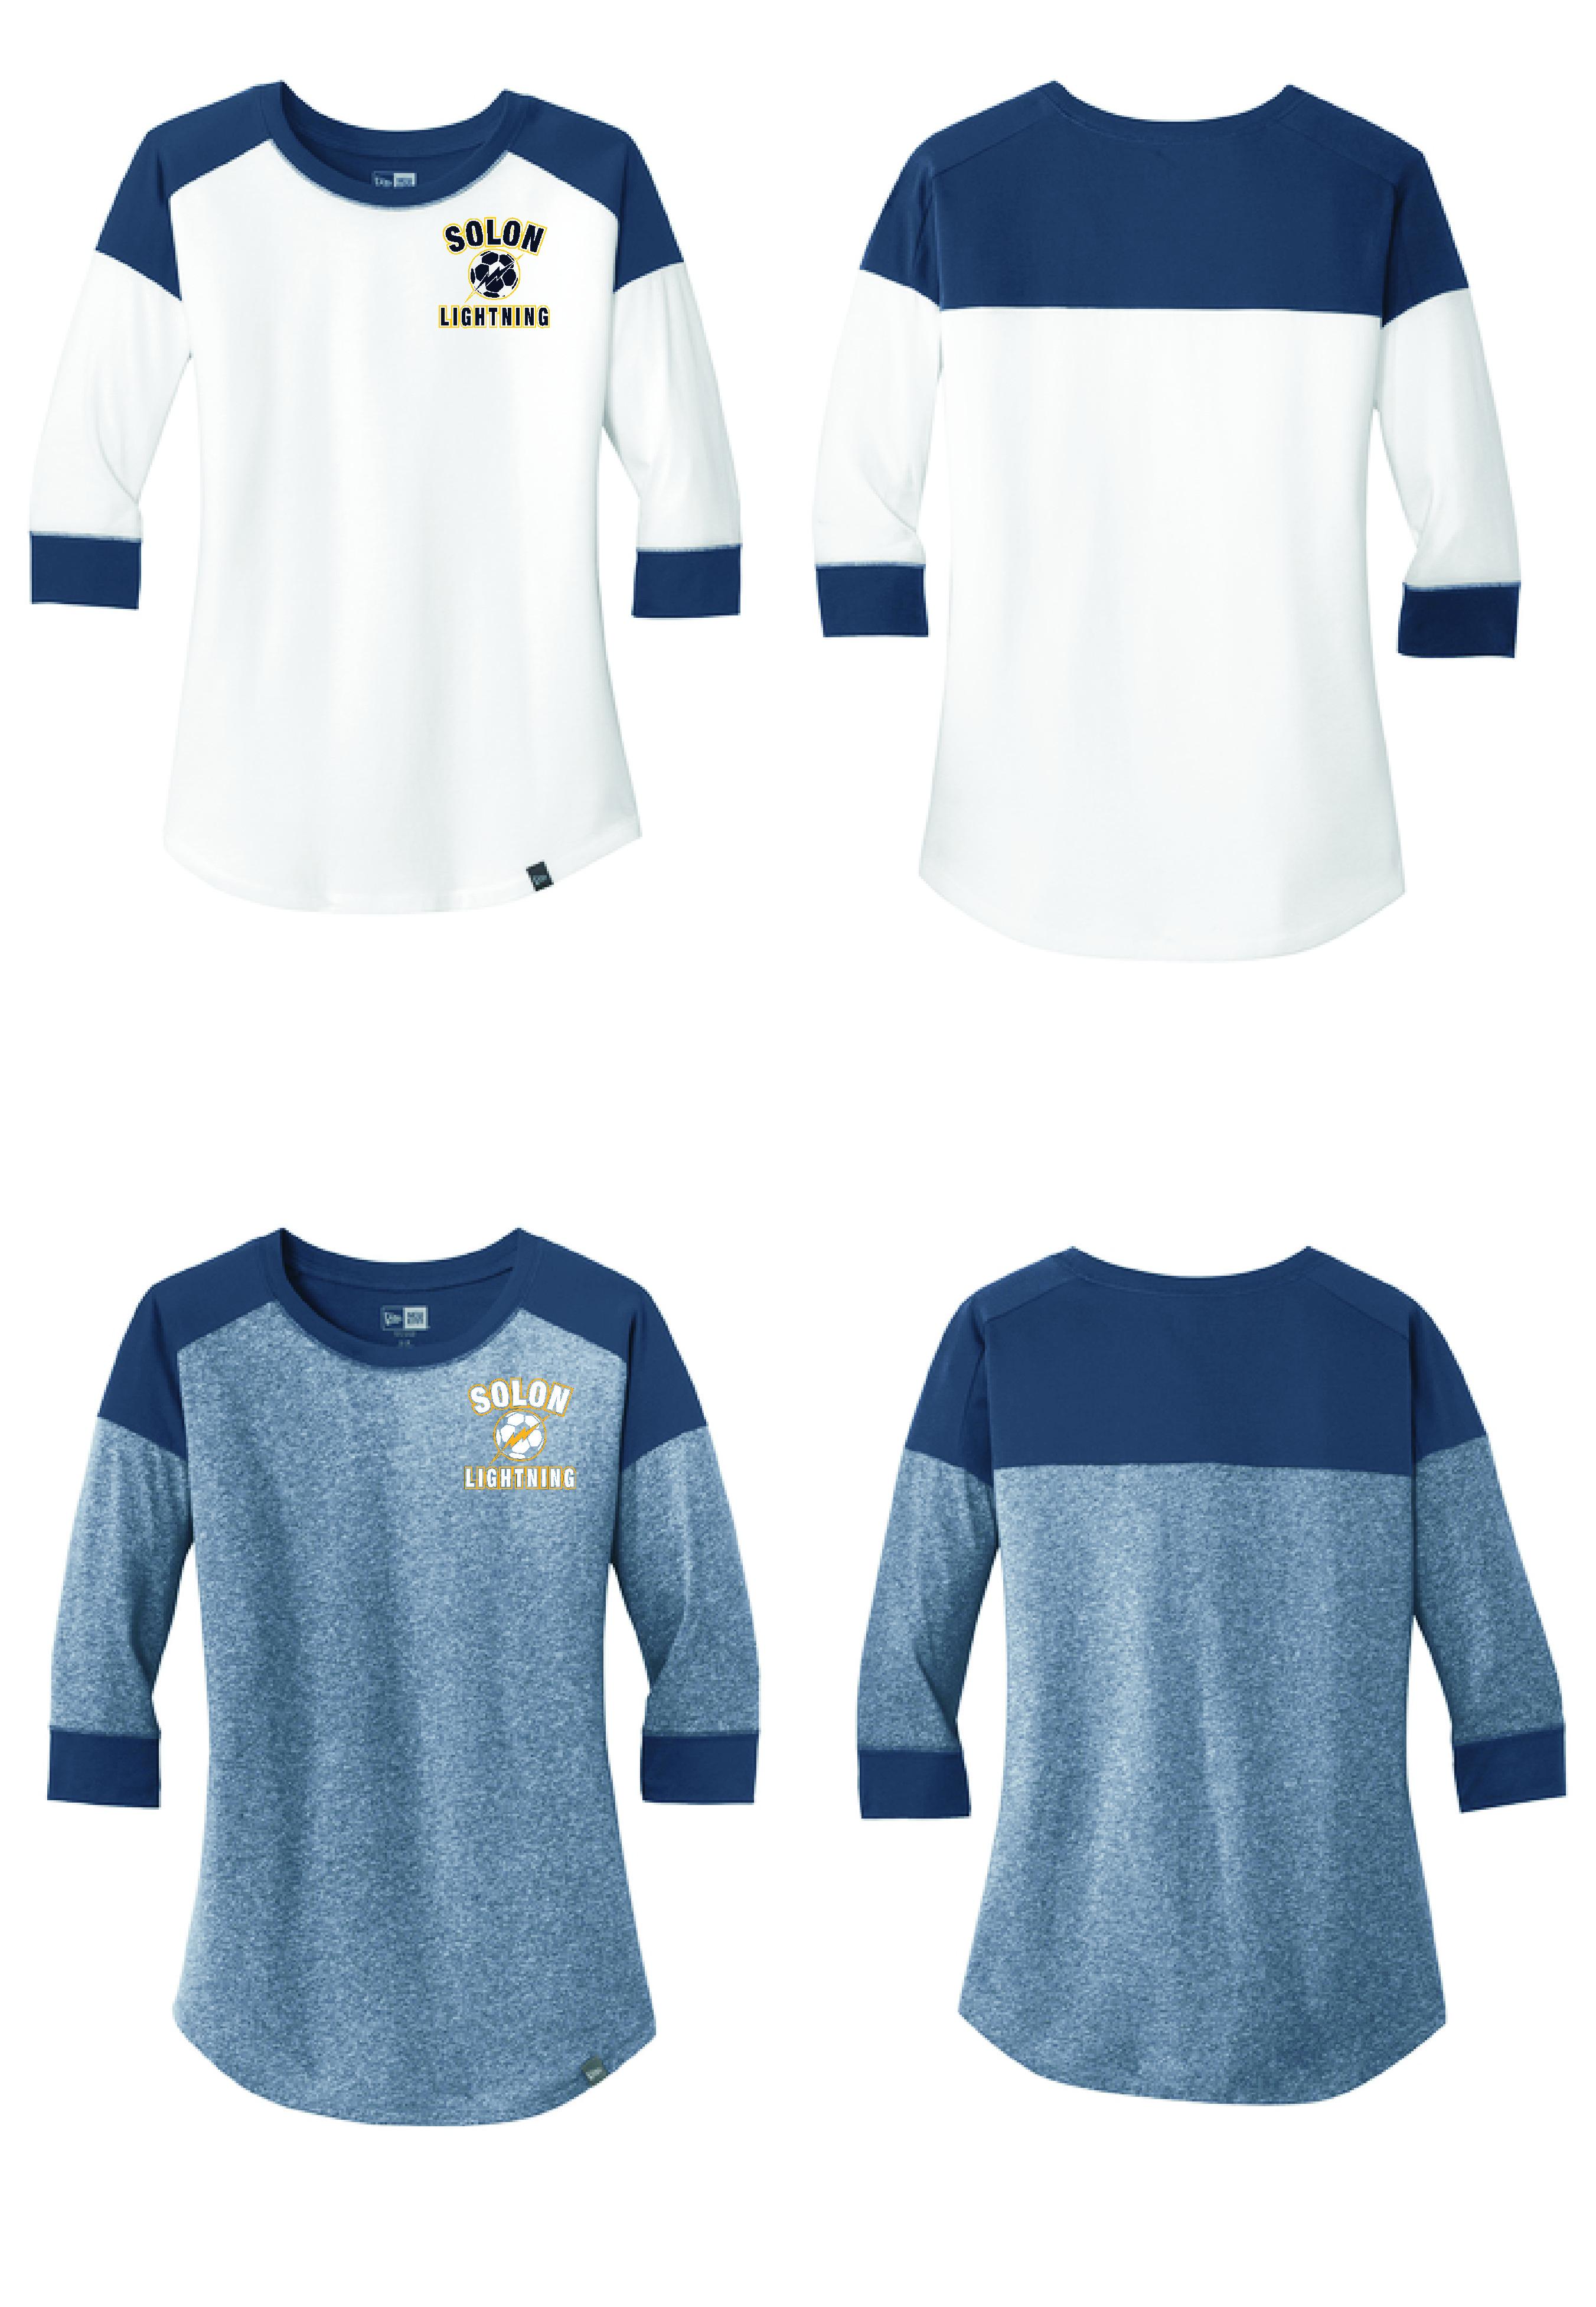 c0b888b6a23a Solon Lightning - New Era Ladies Heritage Blend 3/4-Sleeve Baseball Raglan  Tee